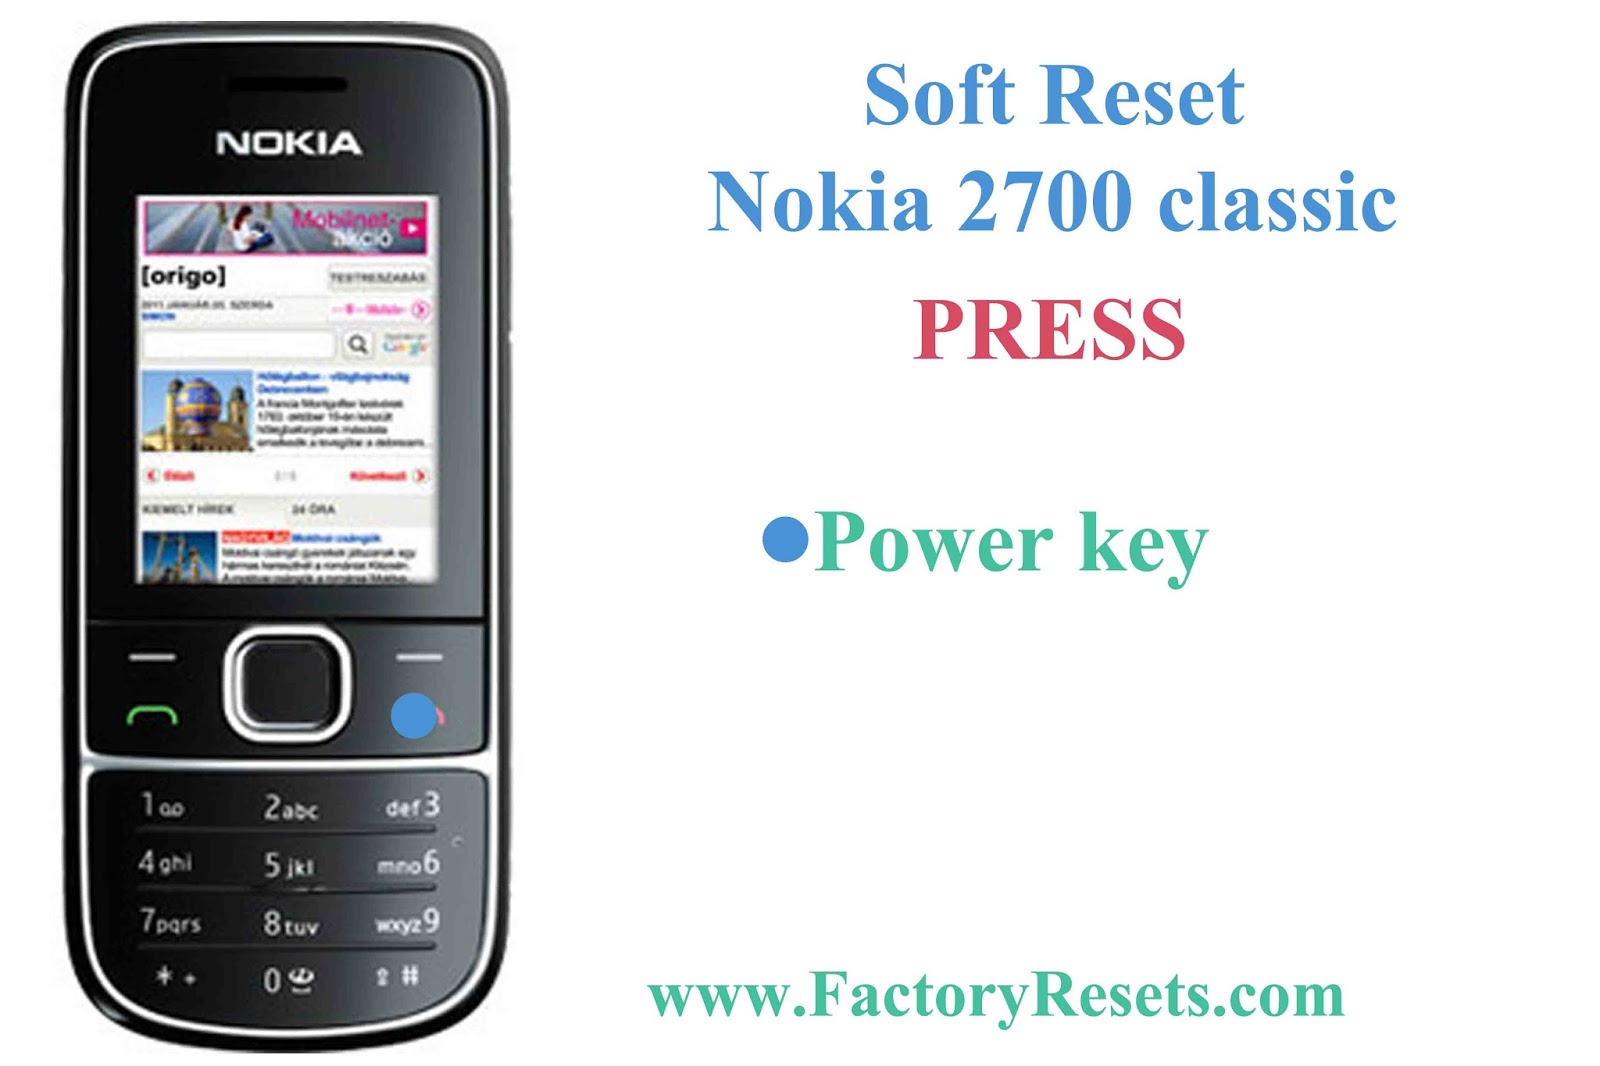 Whatsup messenger for nokia 2700 classic